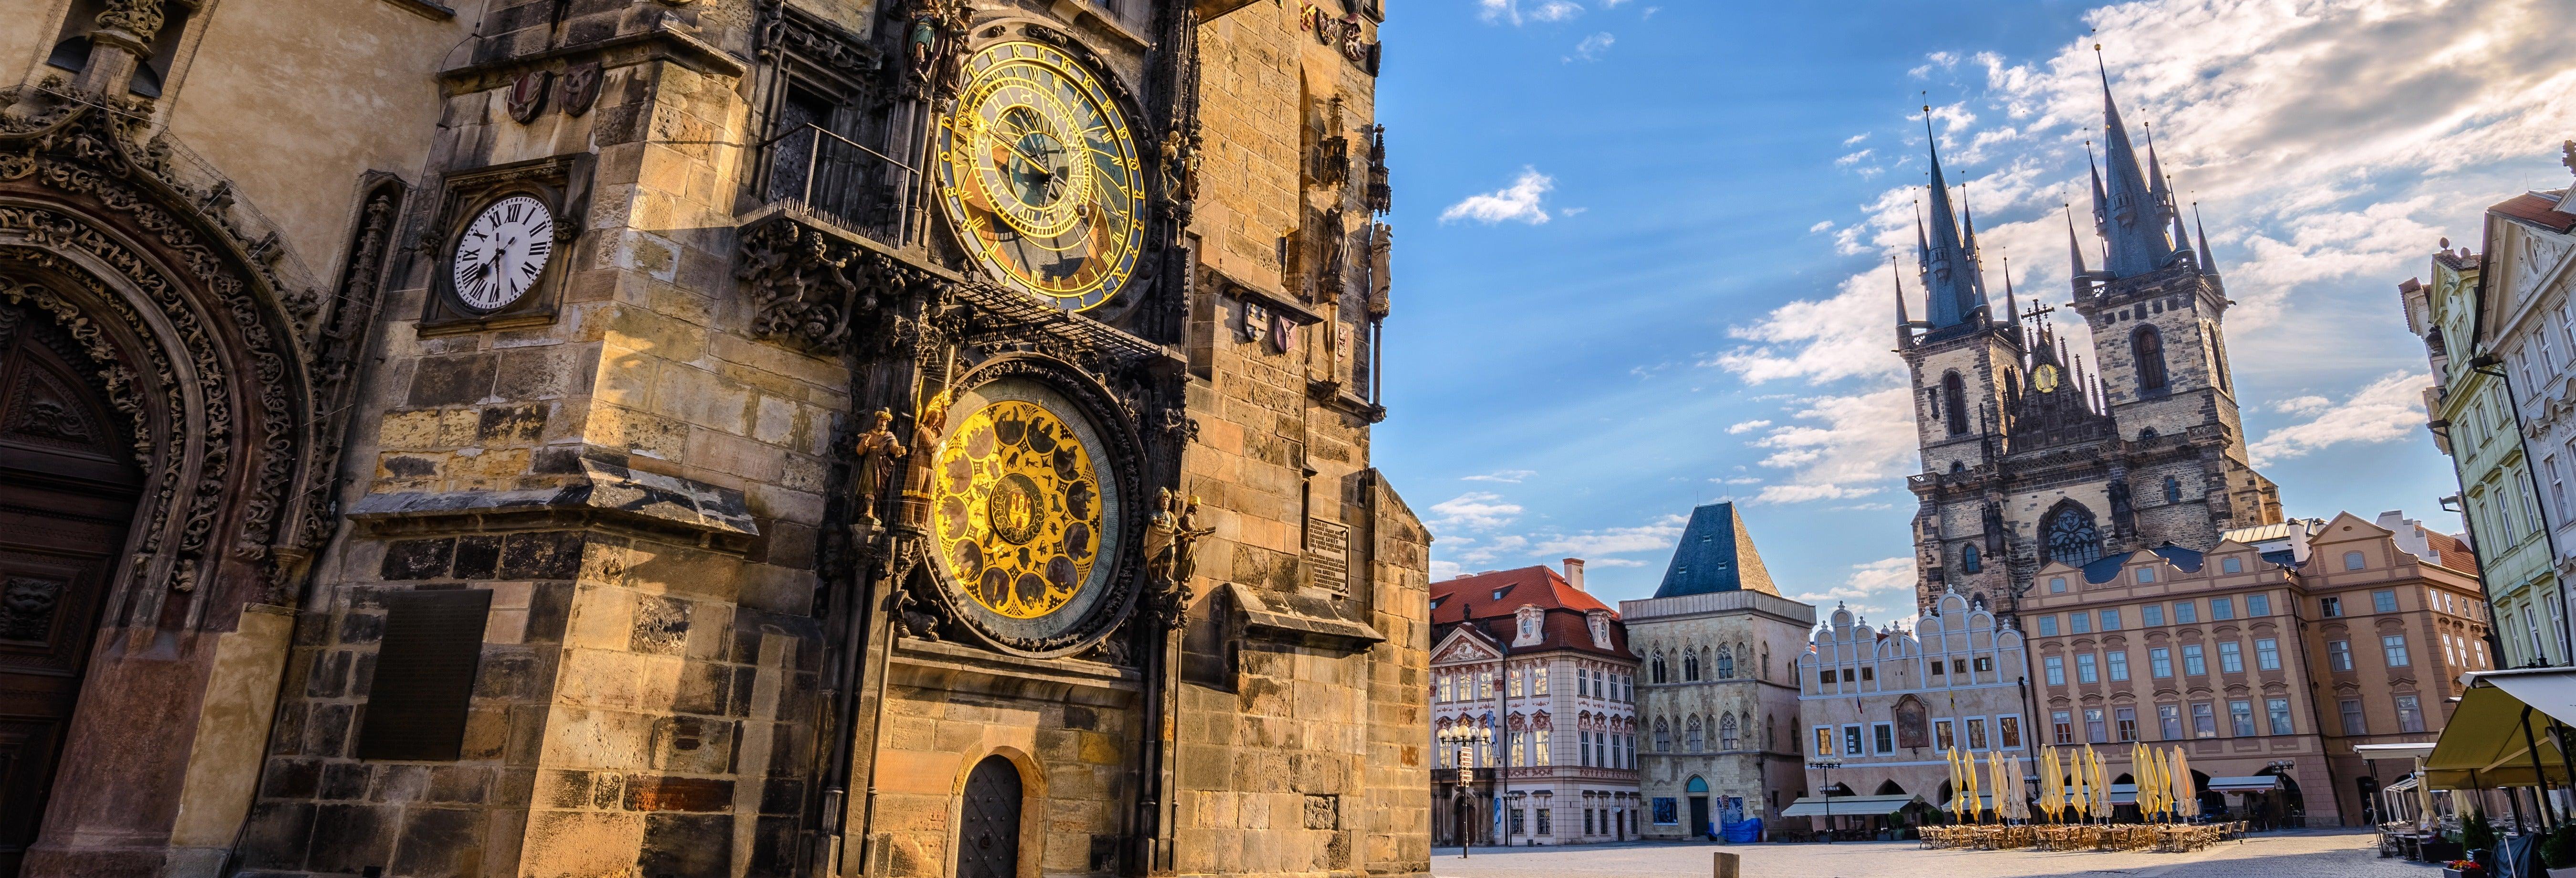 Private Tour of Prague